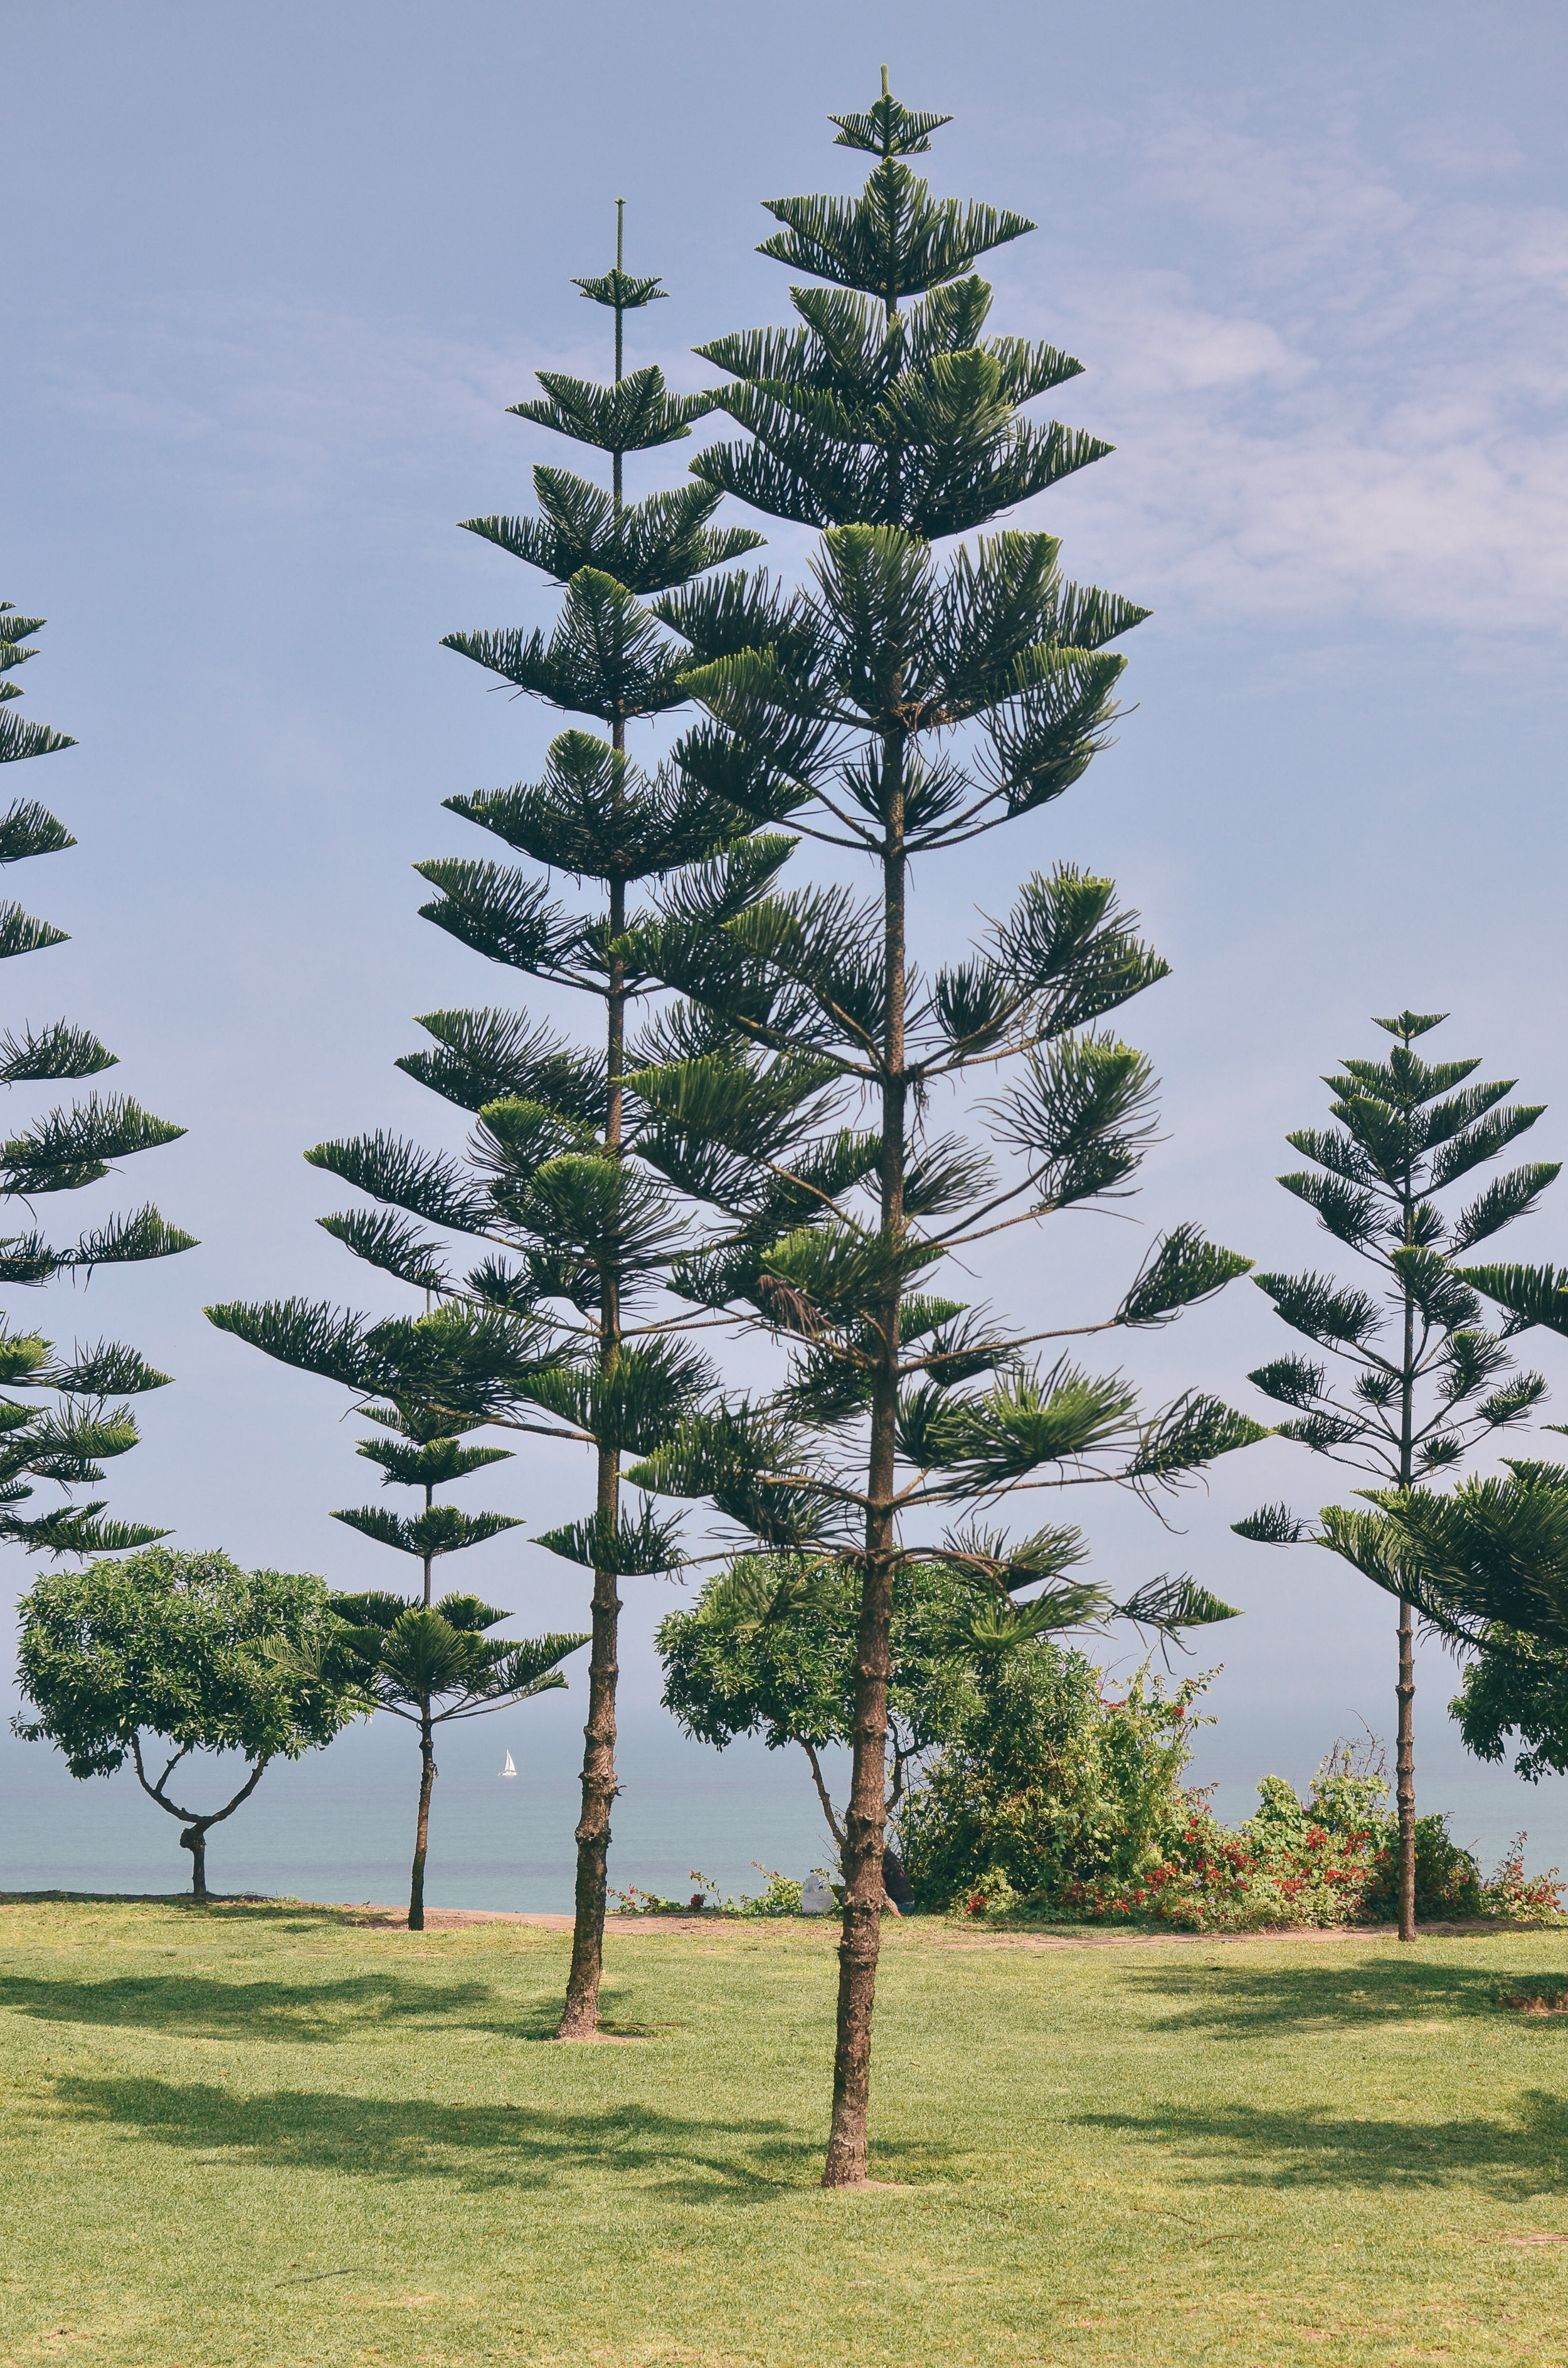 lima+peru+travel+guide+life+on+pine+blog +exchange_DSC_0763.jpg